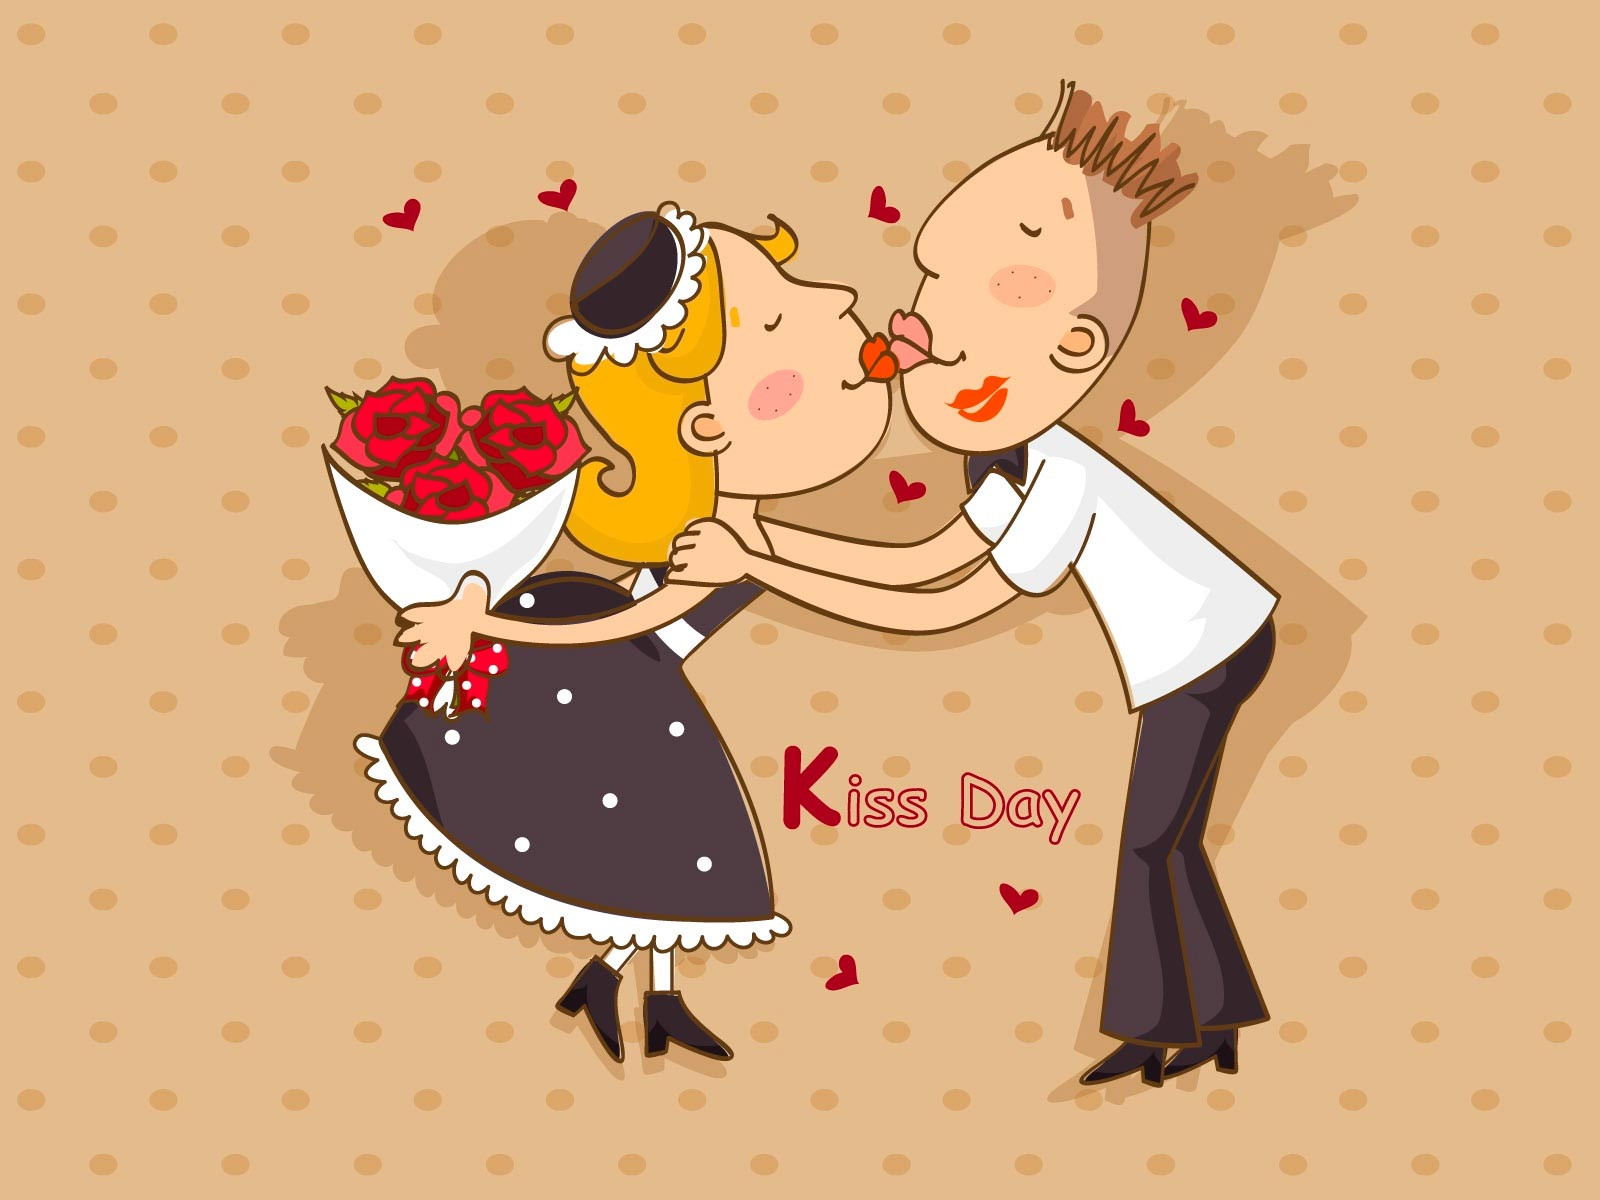 ... поцелуев картинки из категории: Аниме: www.kartinkioboi.ru/photo/anime/den_poceluev/3-0-736